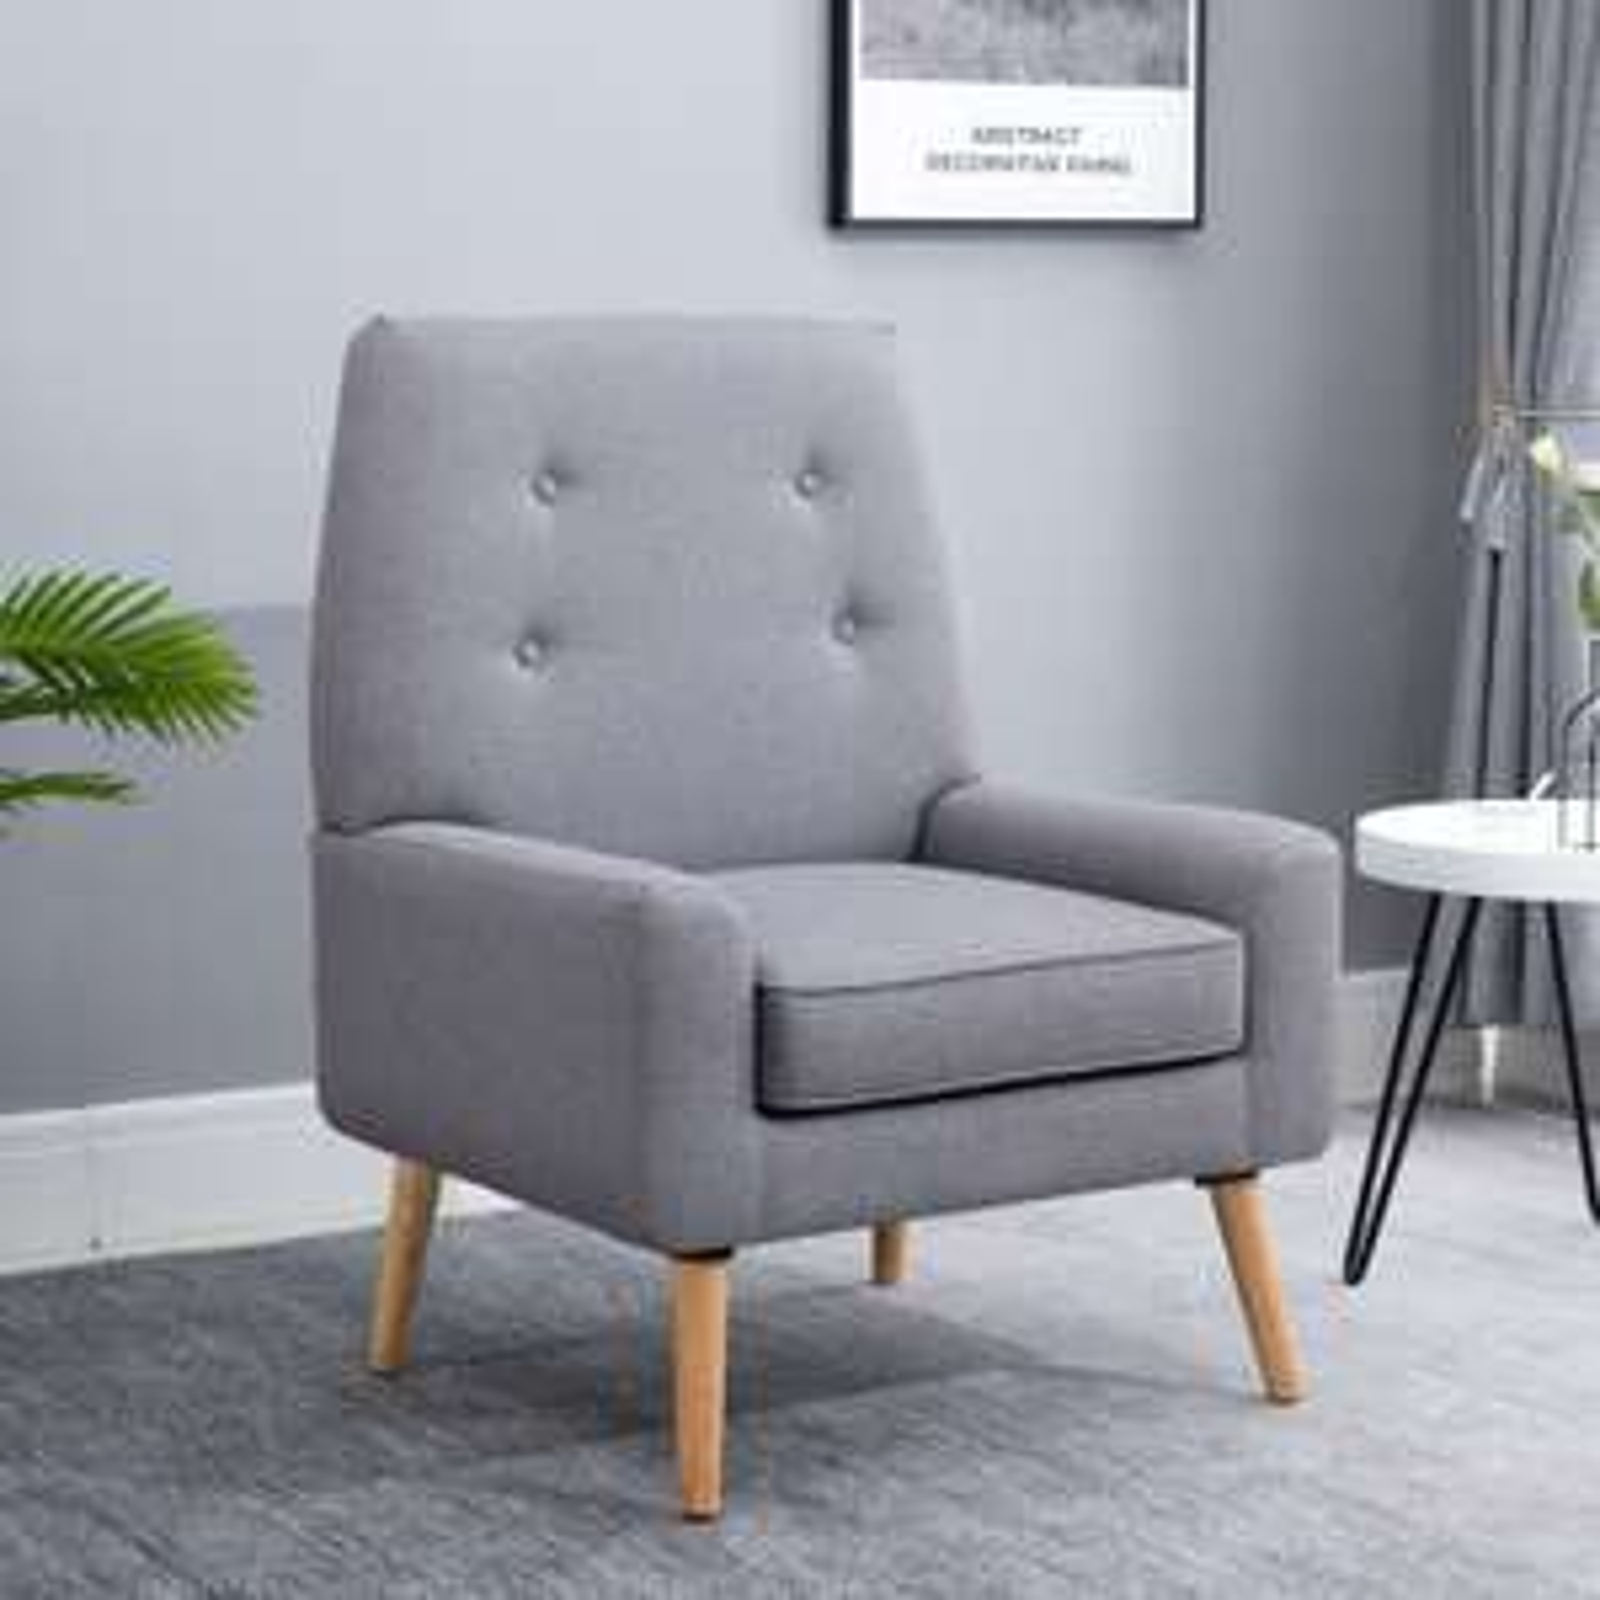 Nordic Cushion Padded Wooden Armchair £75.99, using discount code @ eBay / MHStar